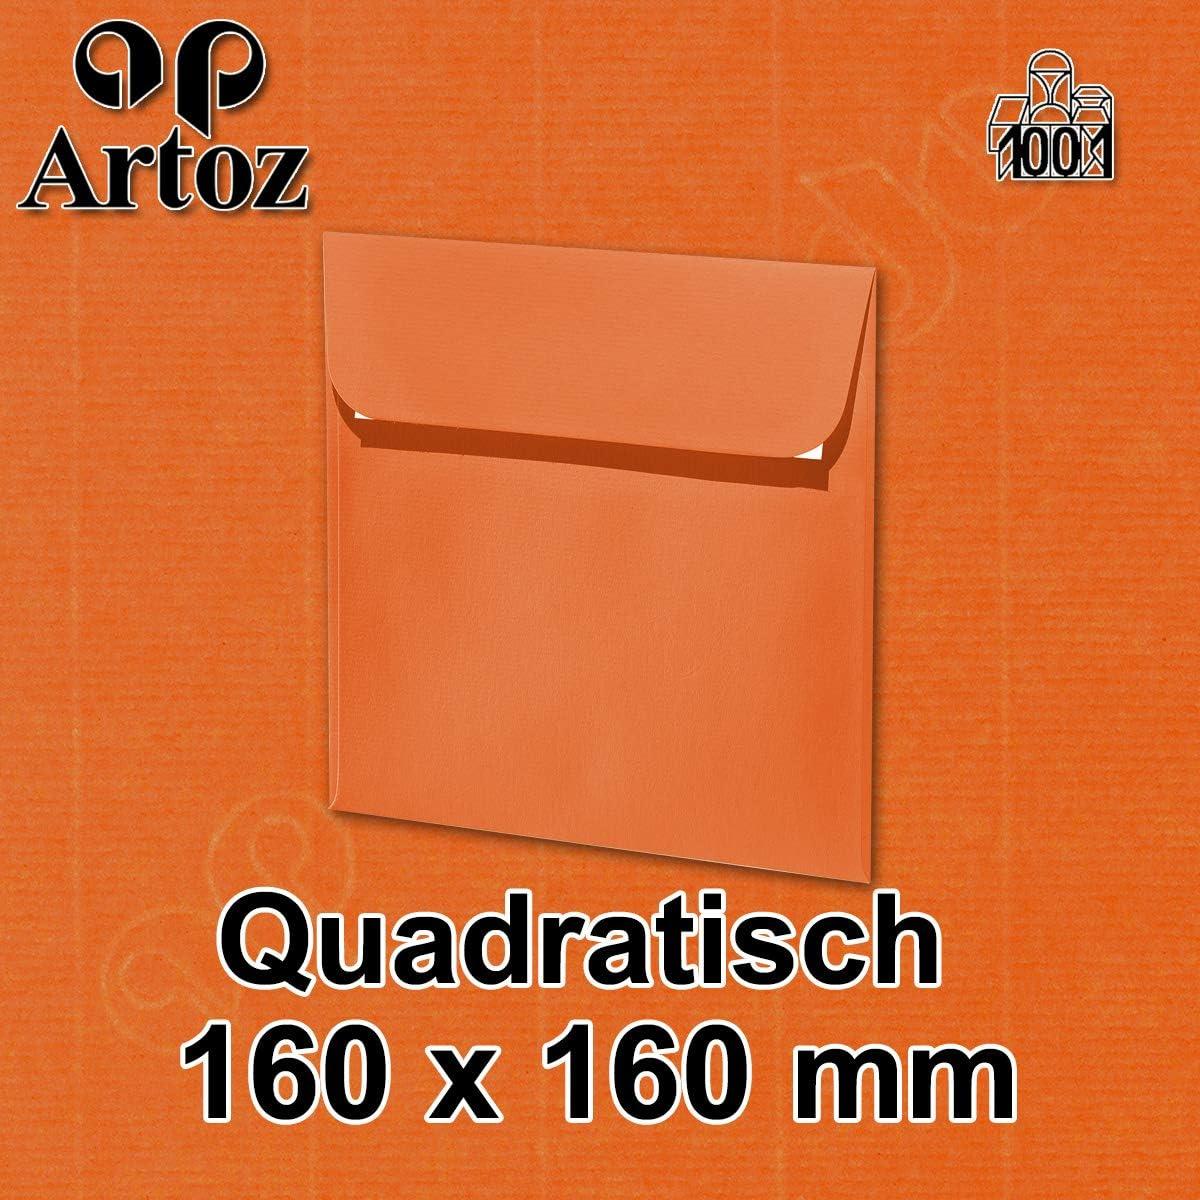 Haftklebung DIN C6 malt gerippt Artoz Serie 1001 Umschl/äge hochwertig 162 x 114mm 50 St/ück